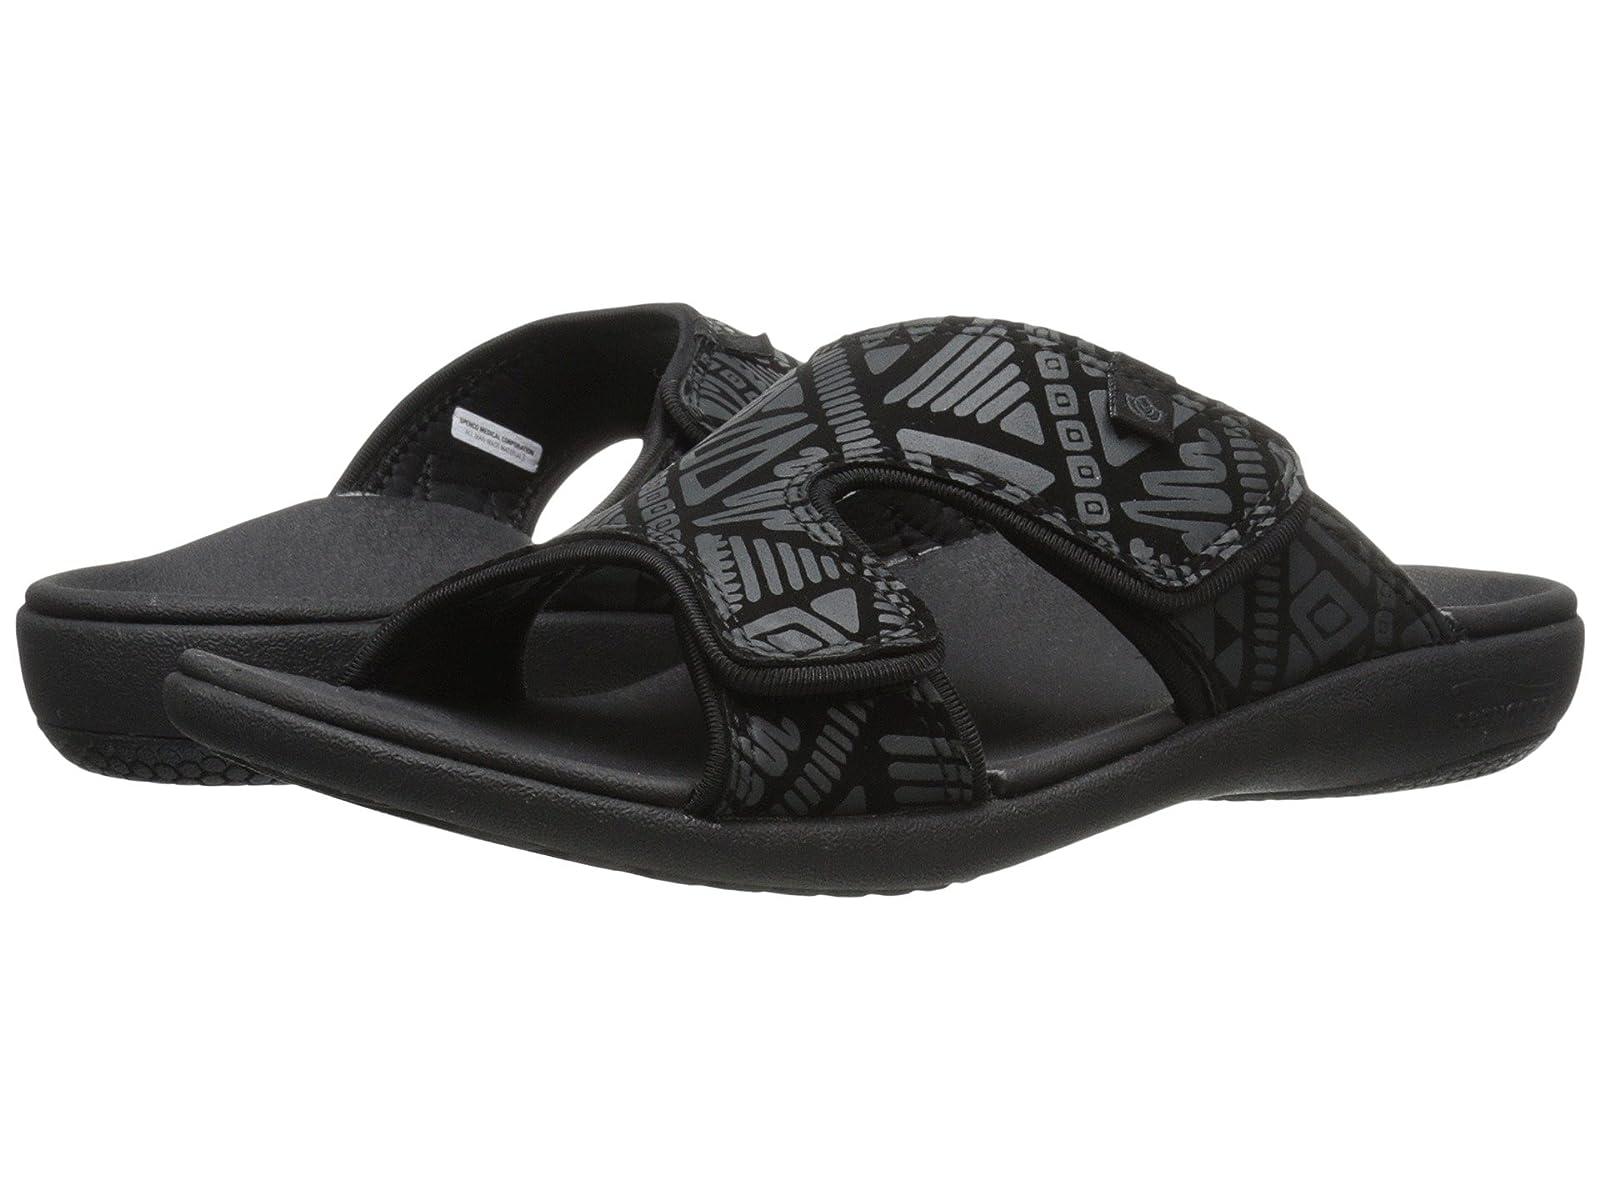 Spenco Kholo Tribal SlideAtmospheric grades have affordable shoes